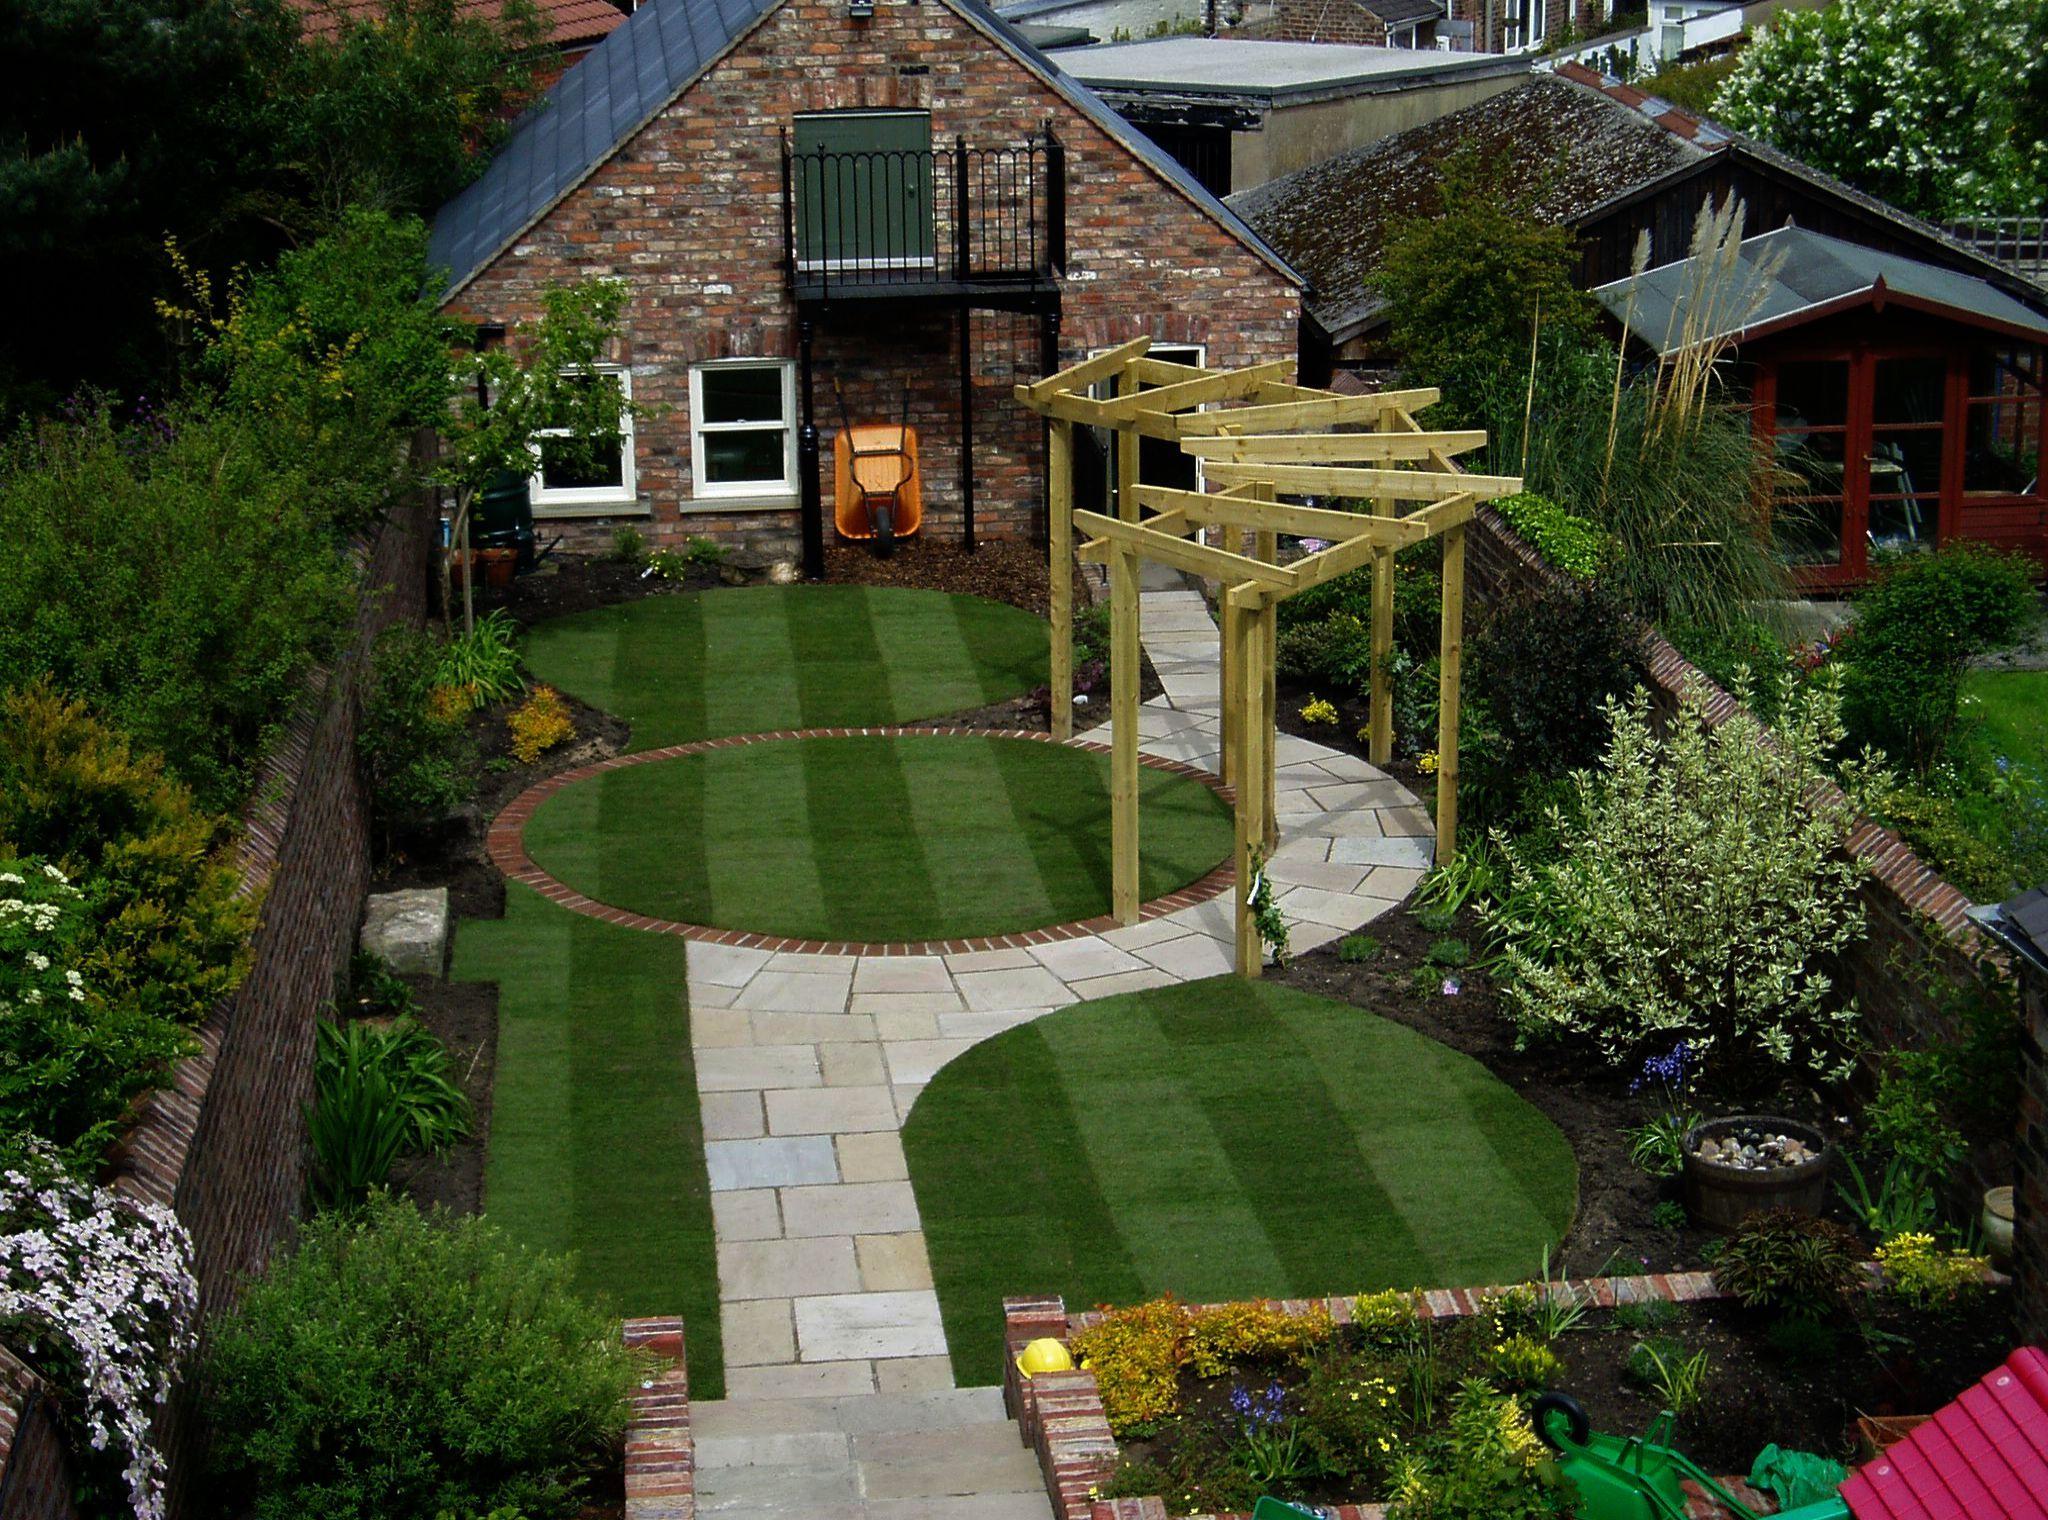 Landscape Gardening Materials Not Landscape Gardening Jobs In Canada His Landscape Gardening Cours Garden Design Plans Modern Garden Design Small Garden Design